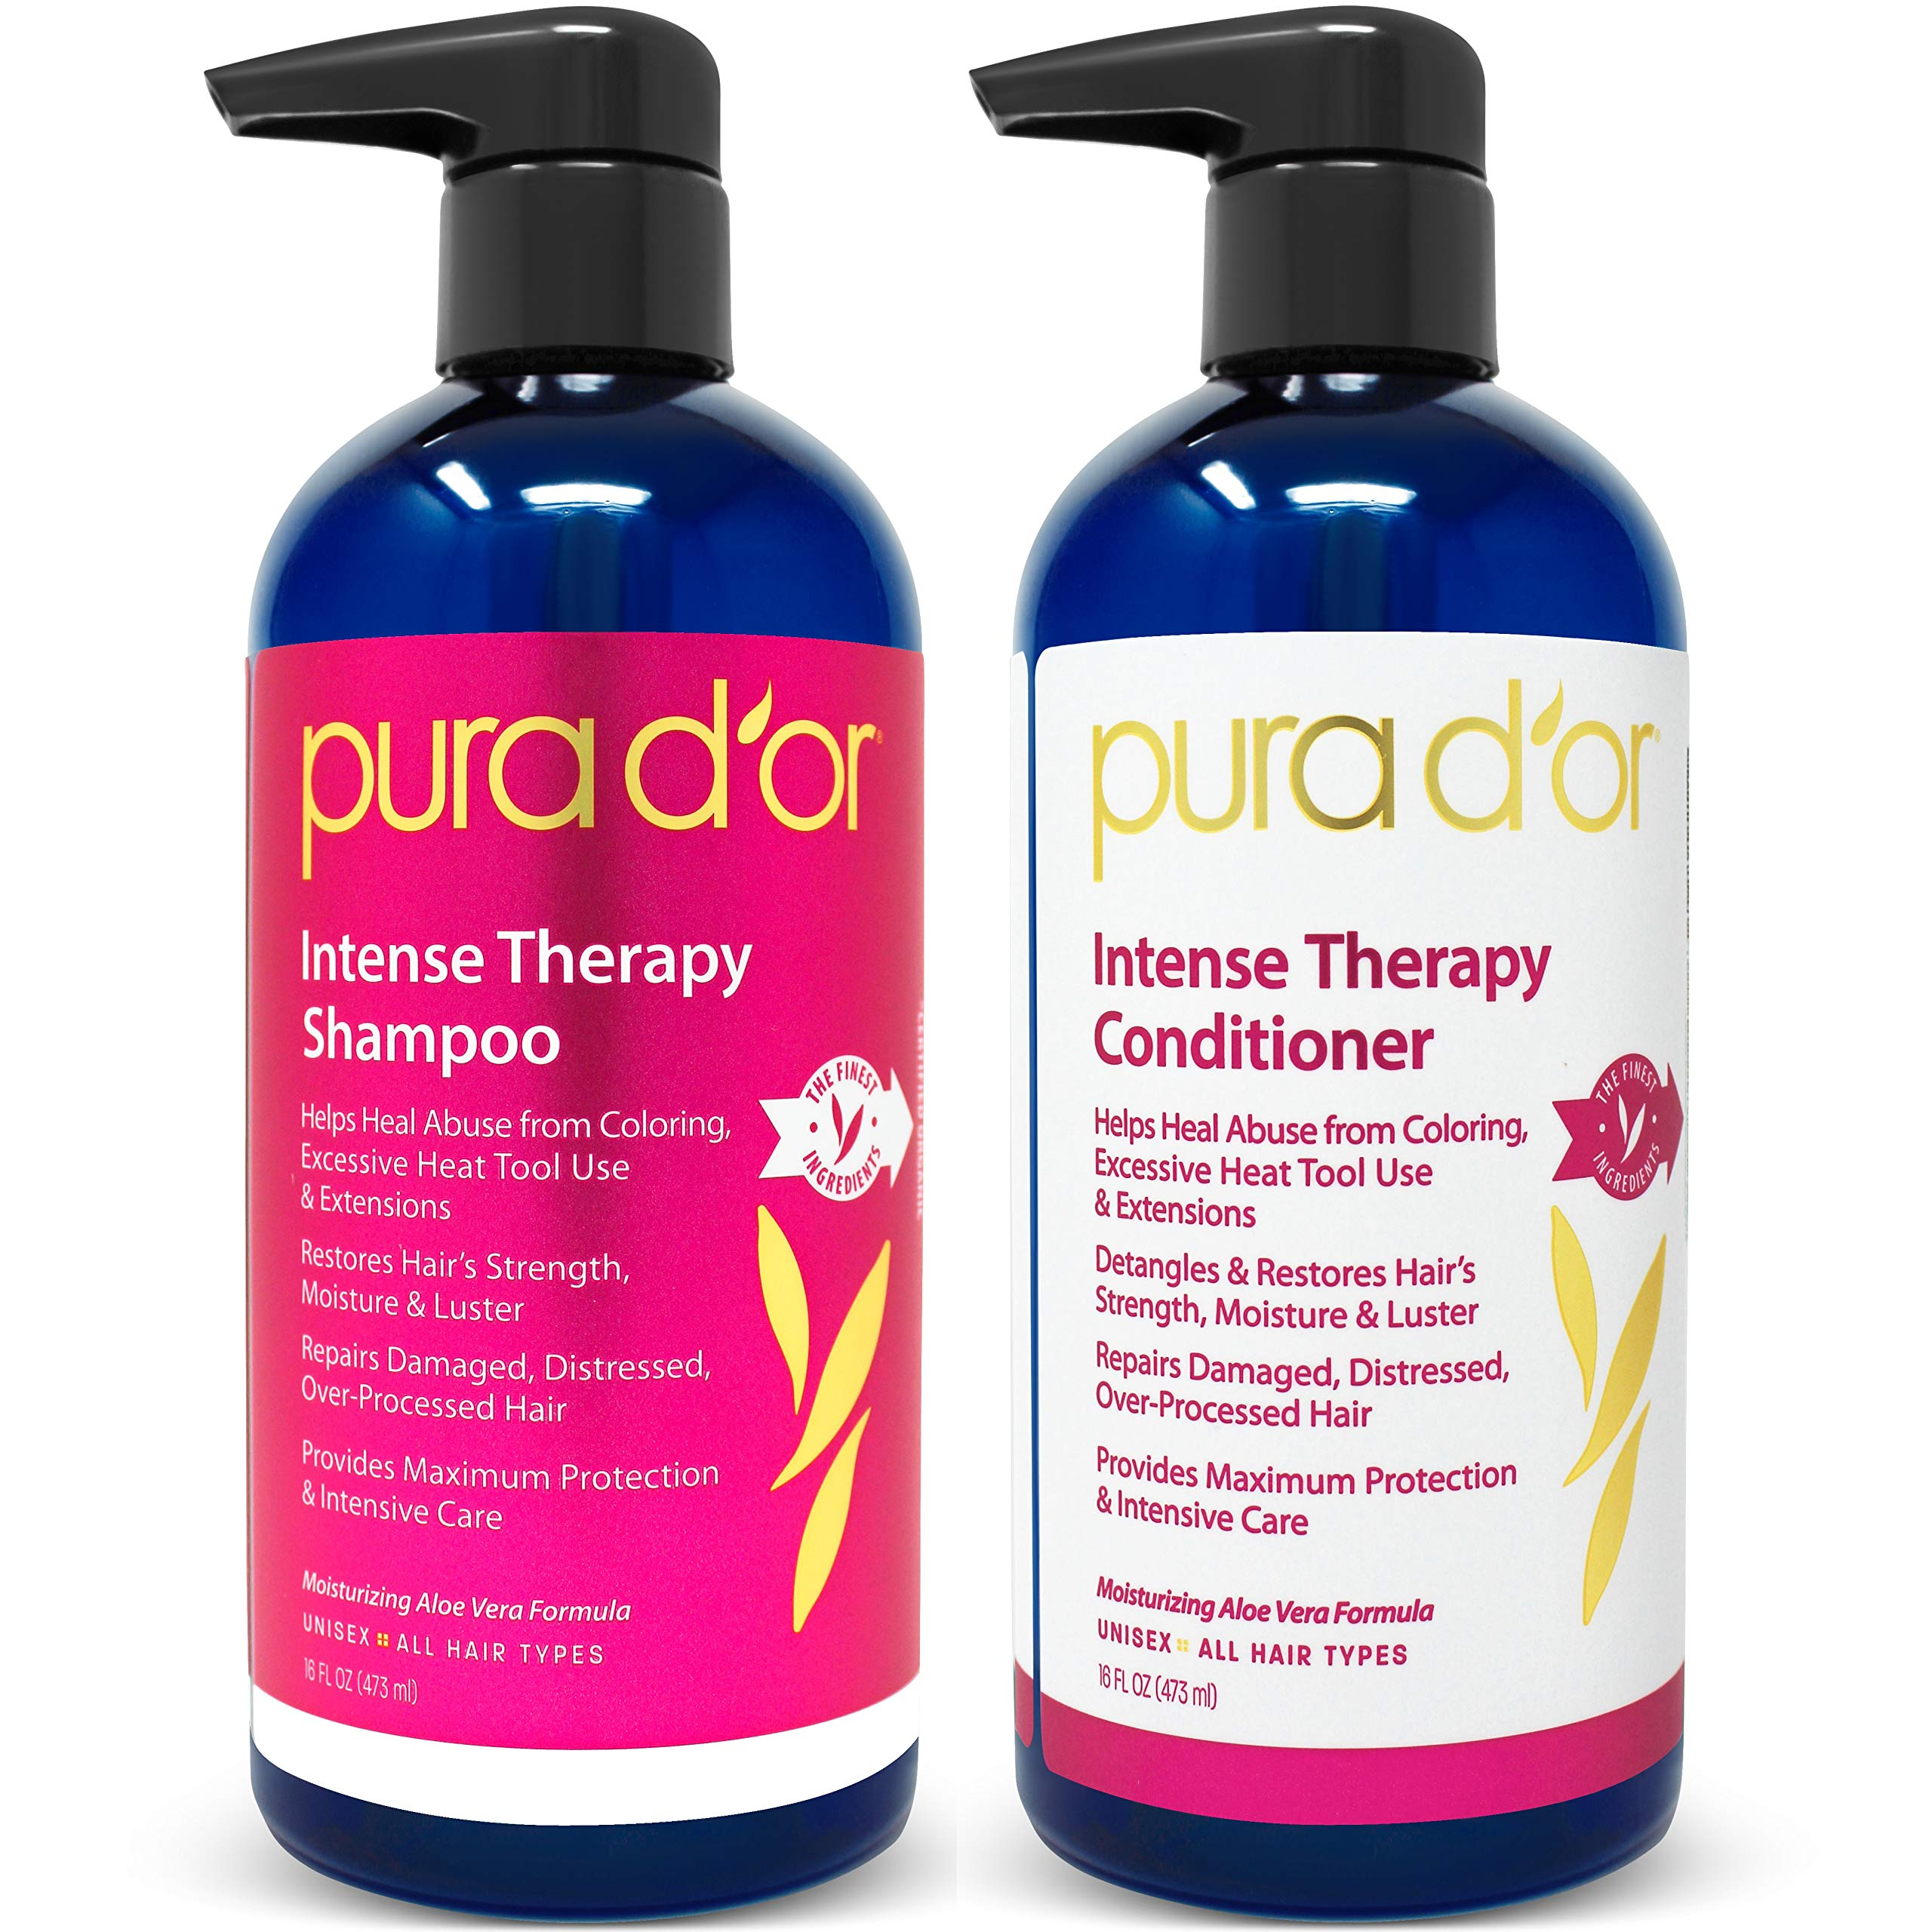 PURA D'OR Intense Therapy Shampoo & Conditioner